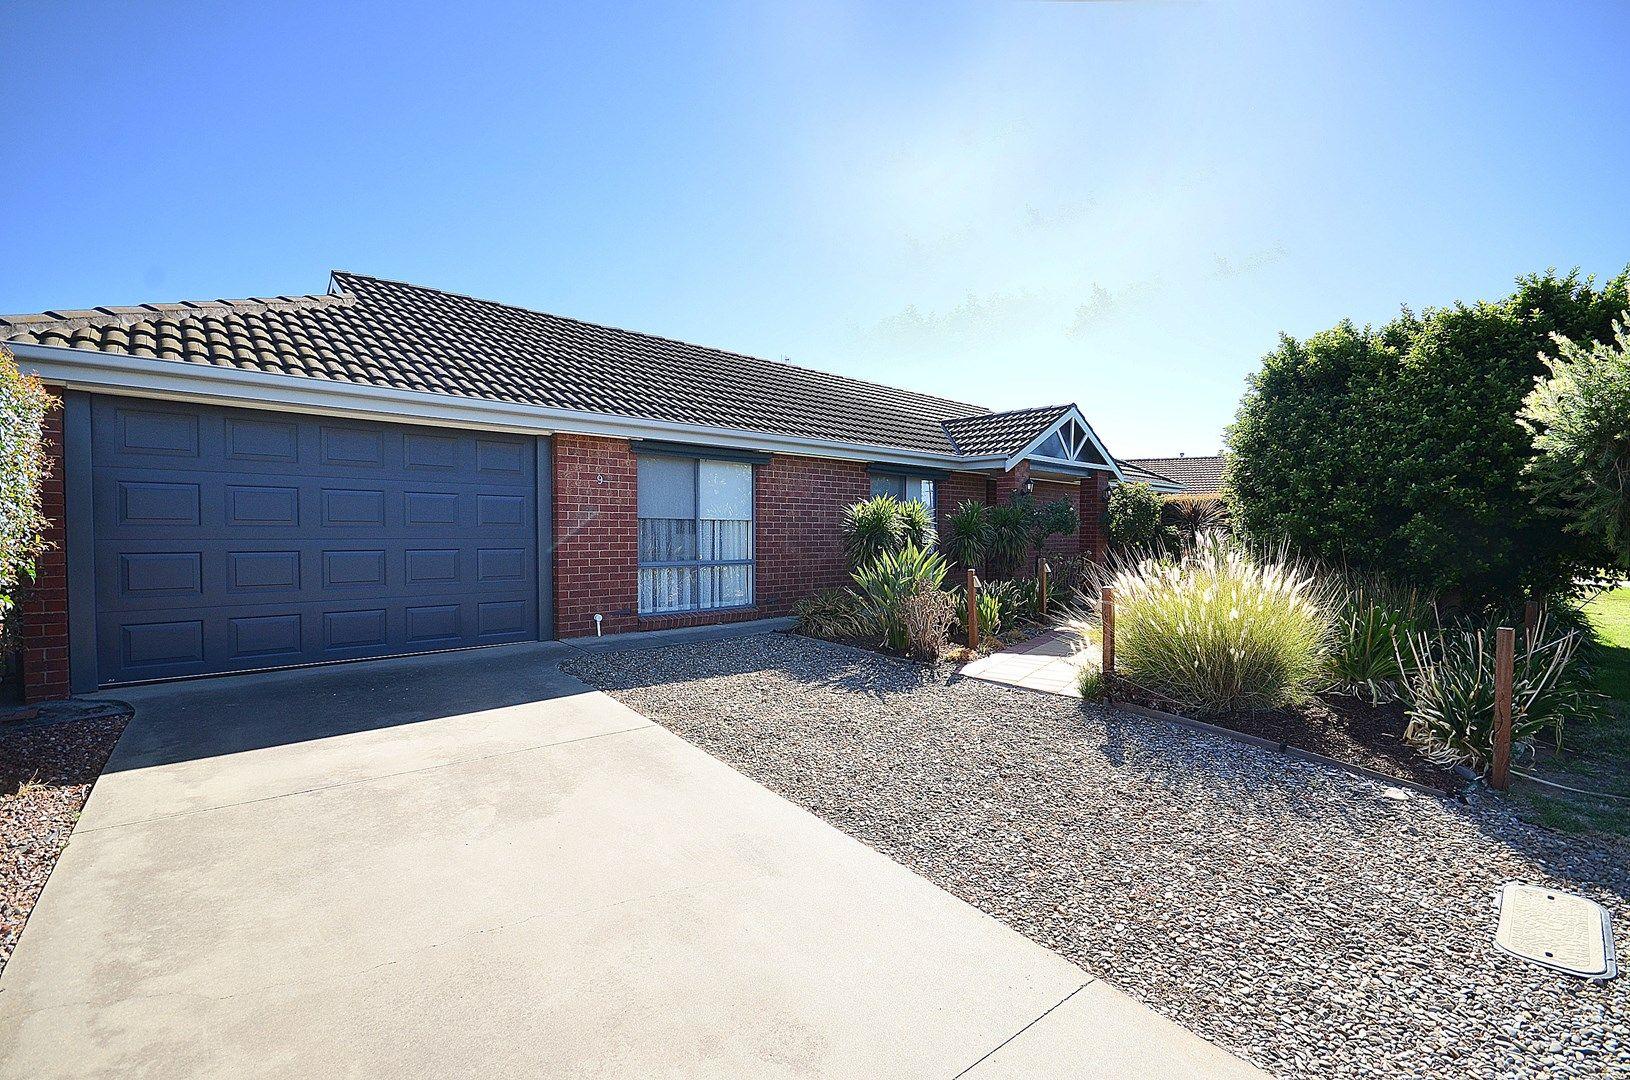 9 McLaren Drive, Moama NSW 2731, Image 0